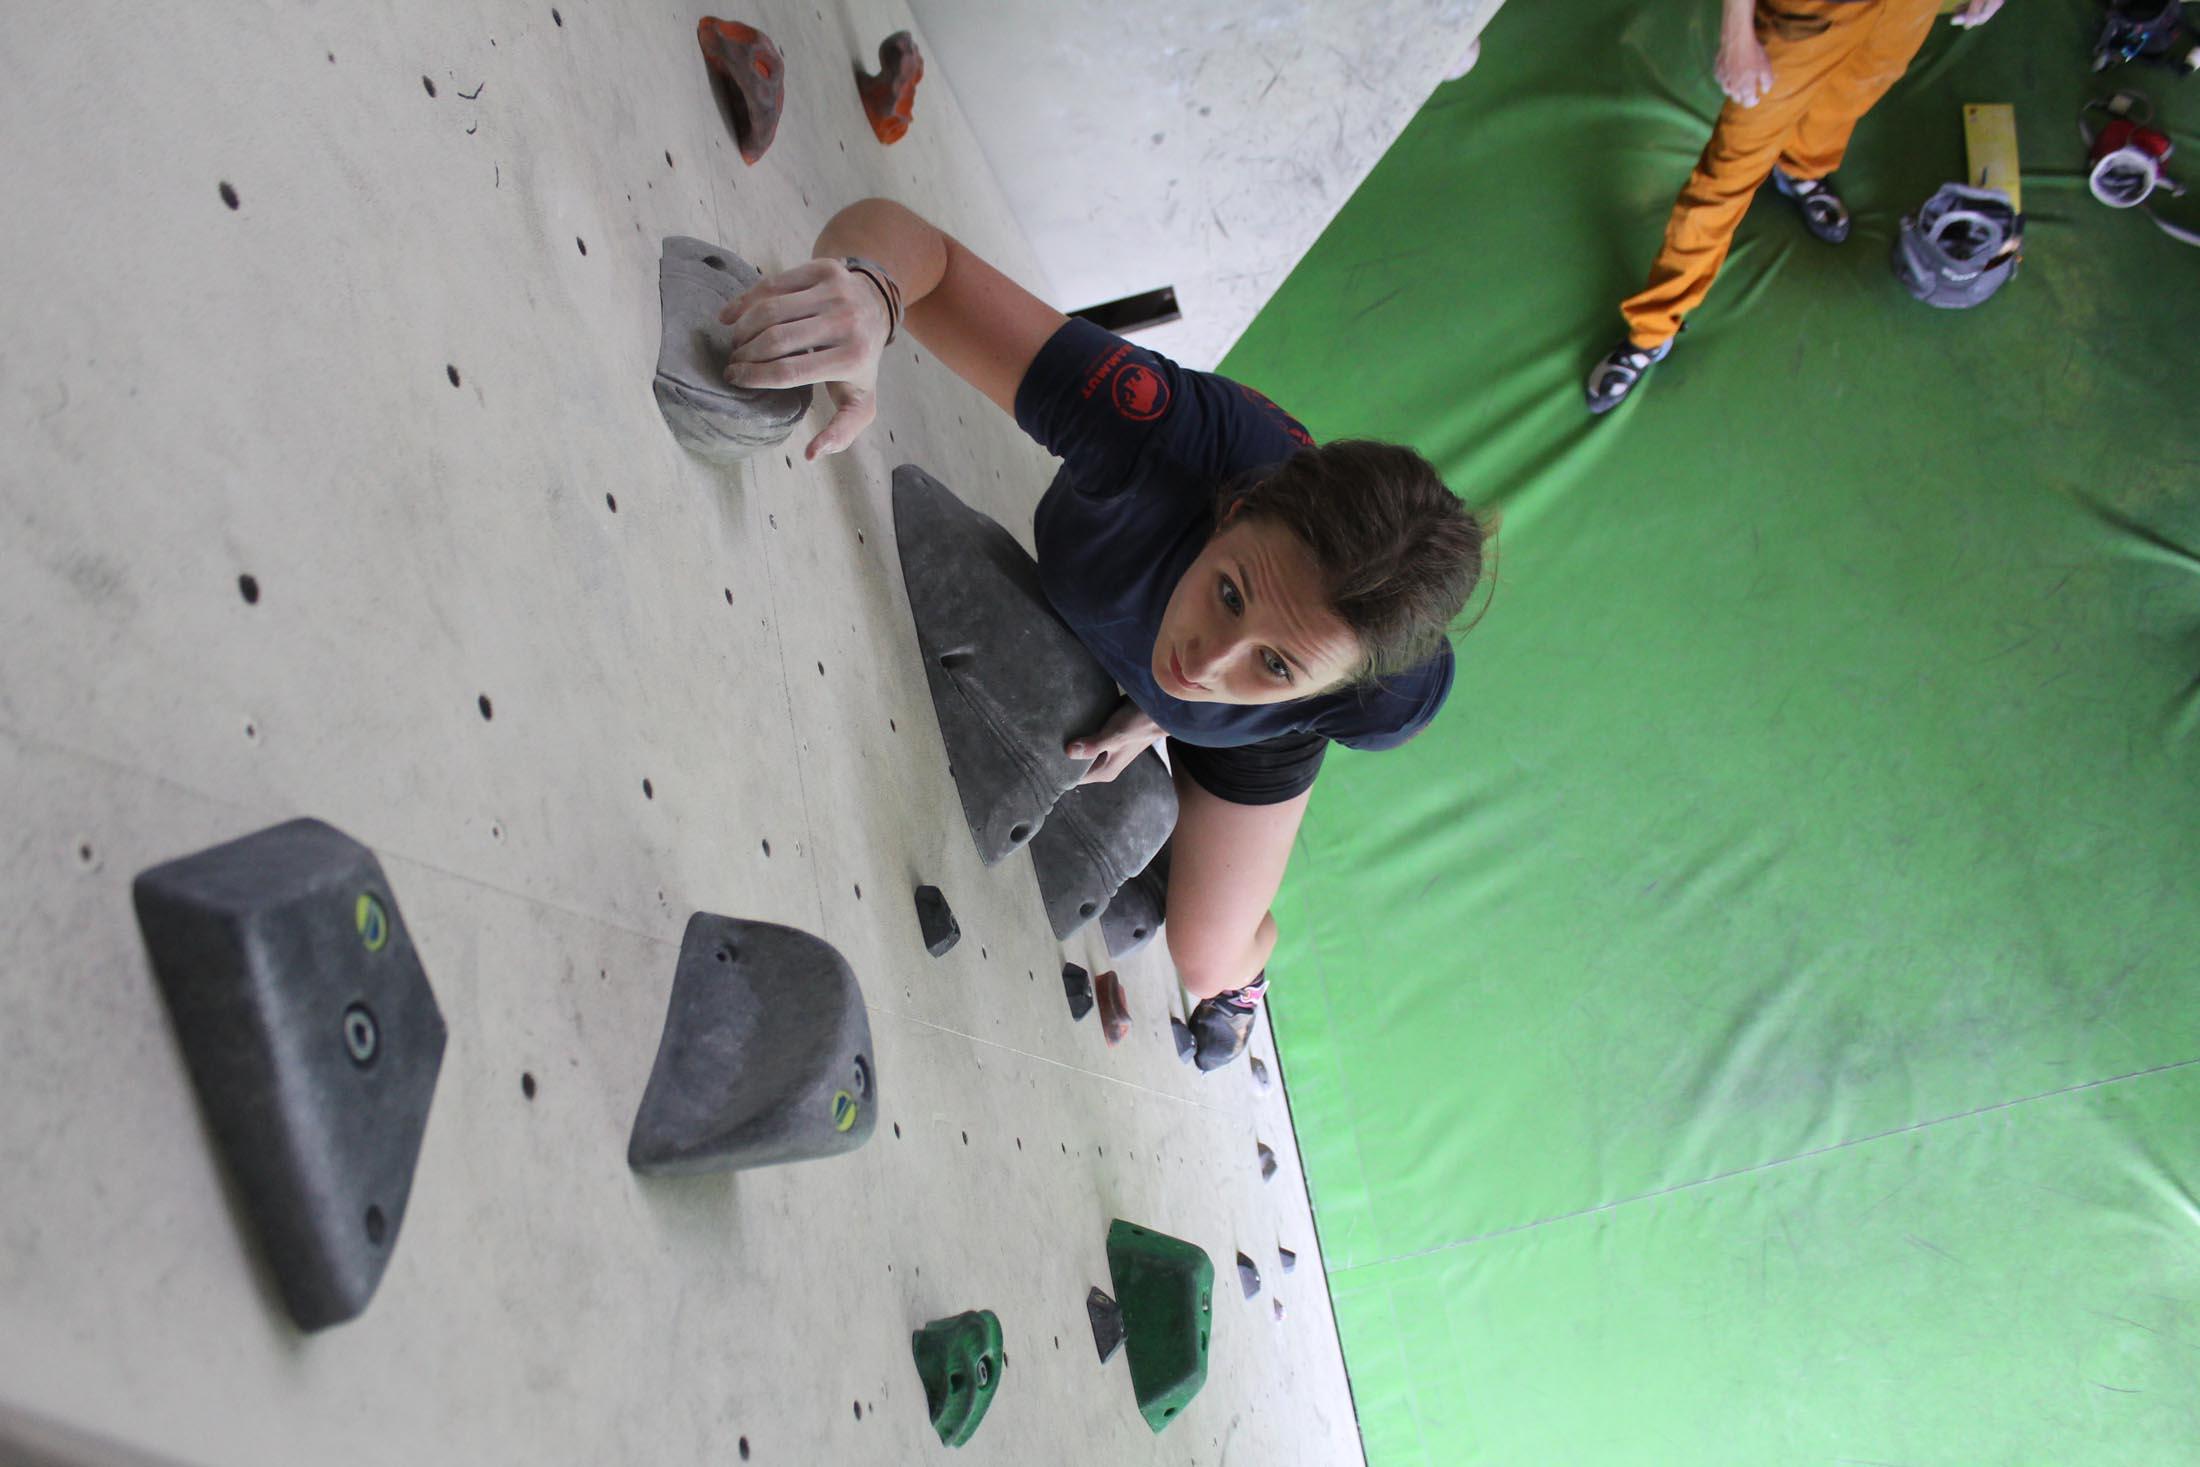 Quali, internationaler bouldercup Frankenjura 2016, BLOCKHELDEN Erlangen, Mammut, Bergfreunde.de, Boulderwettkampf07092016144